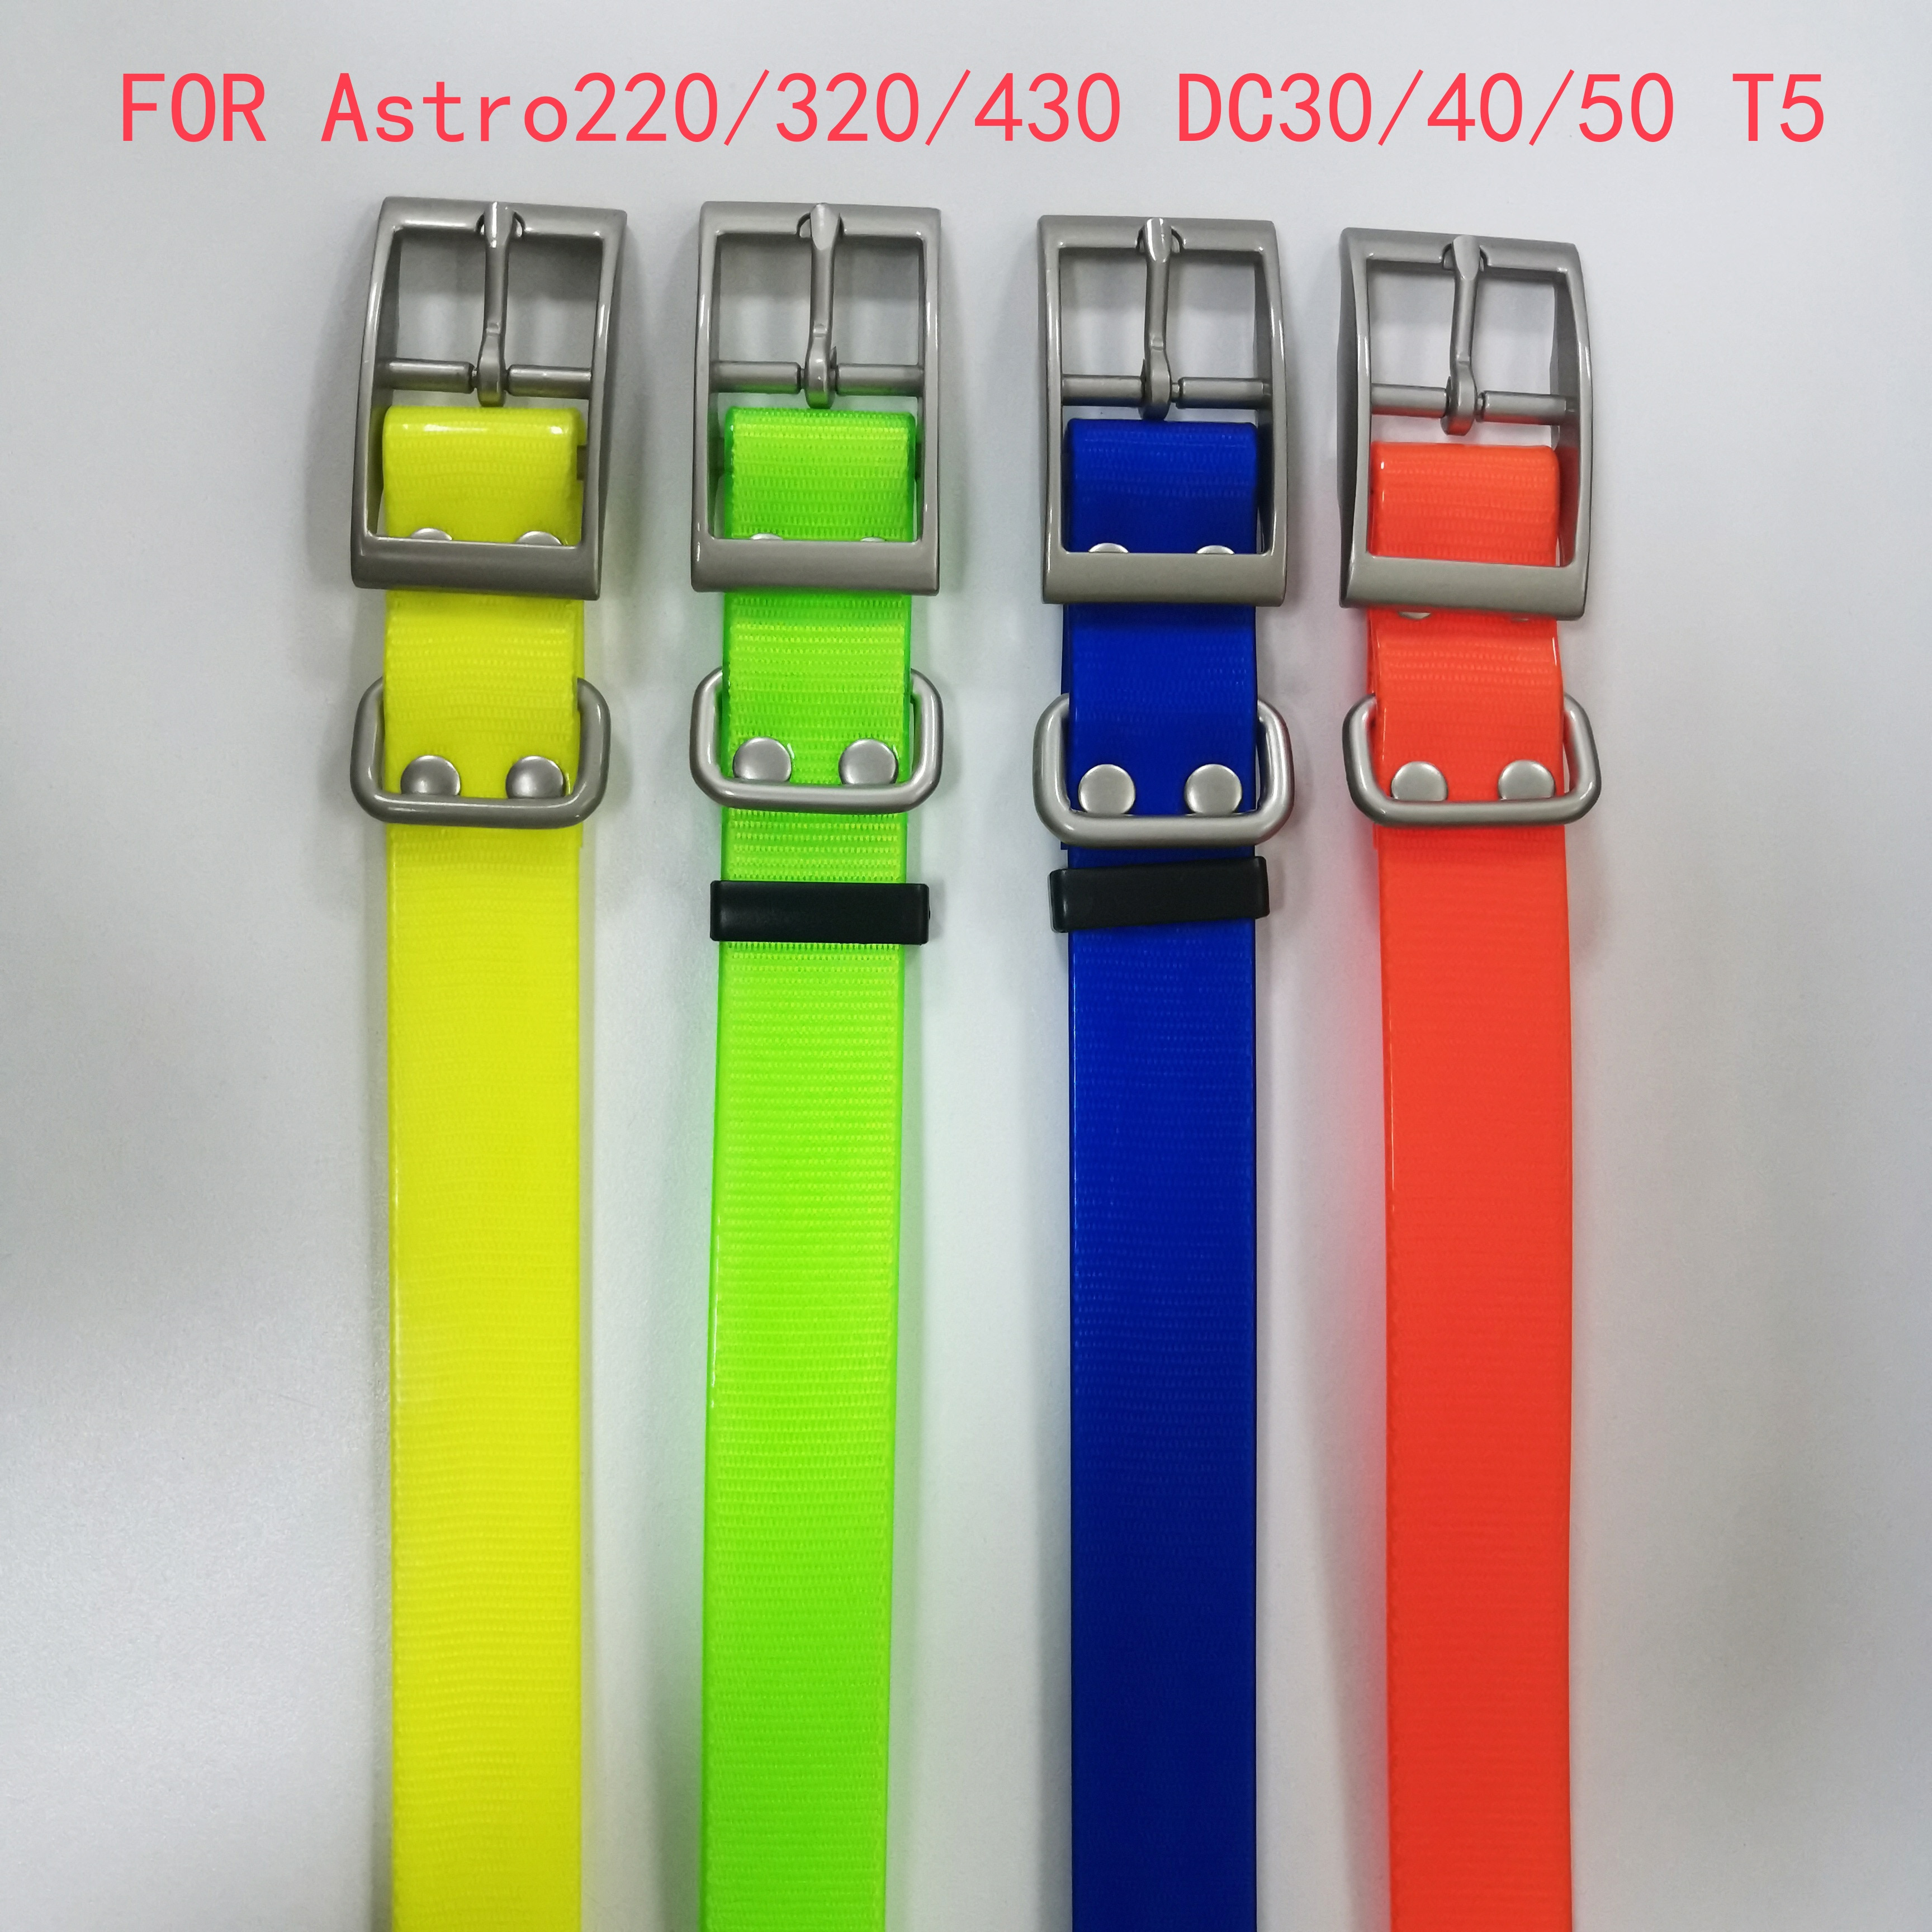 Dog Collar Tracking Collar GPS Collars For Garmin Astro220 Astro320 Astro430 DC30 DC40 DC50 T5 Brand